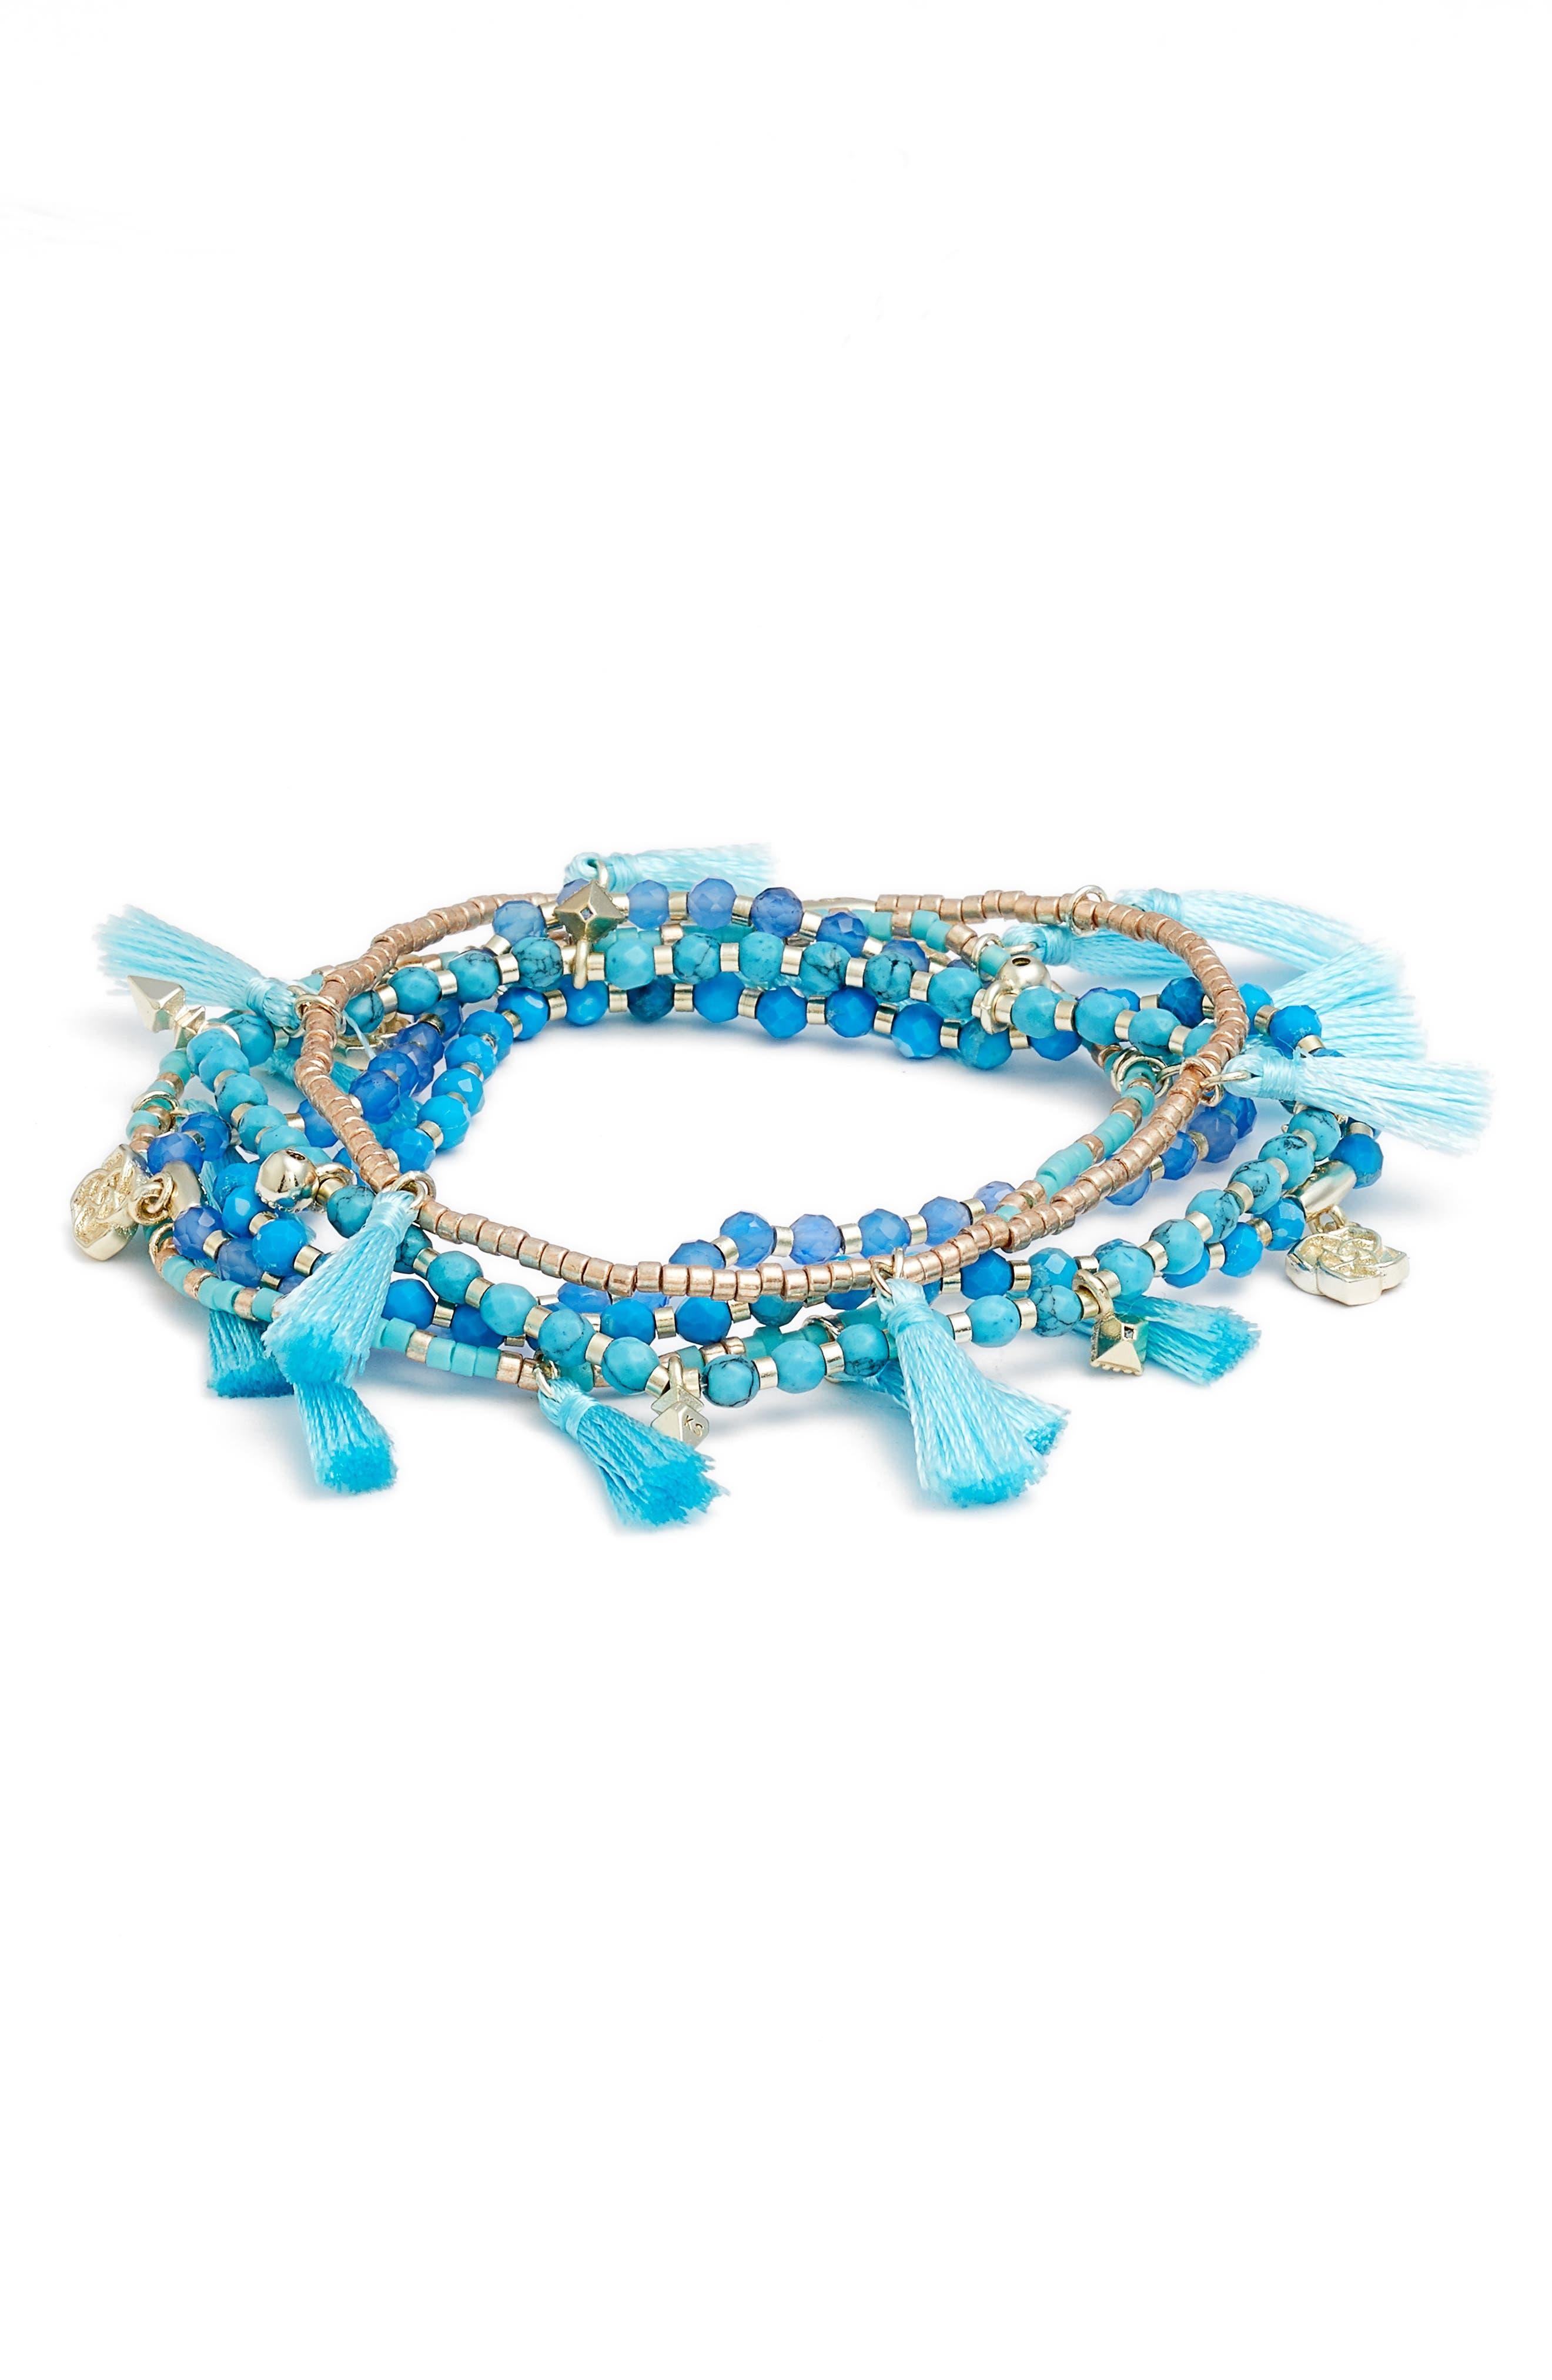 Julie Tassel Bracelet,                         Main,                         color, AQUA MIX/ GOLD